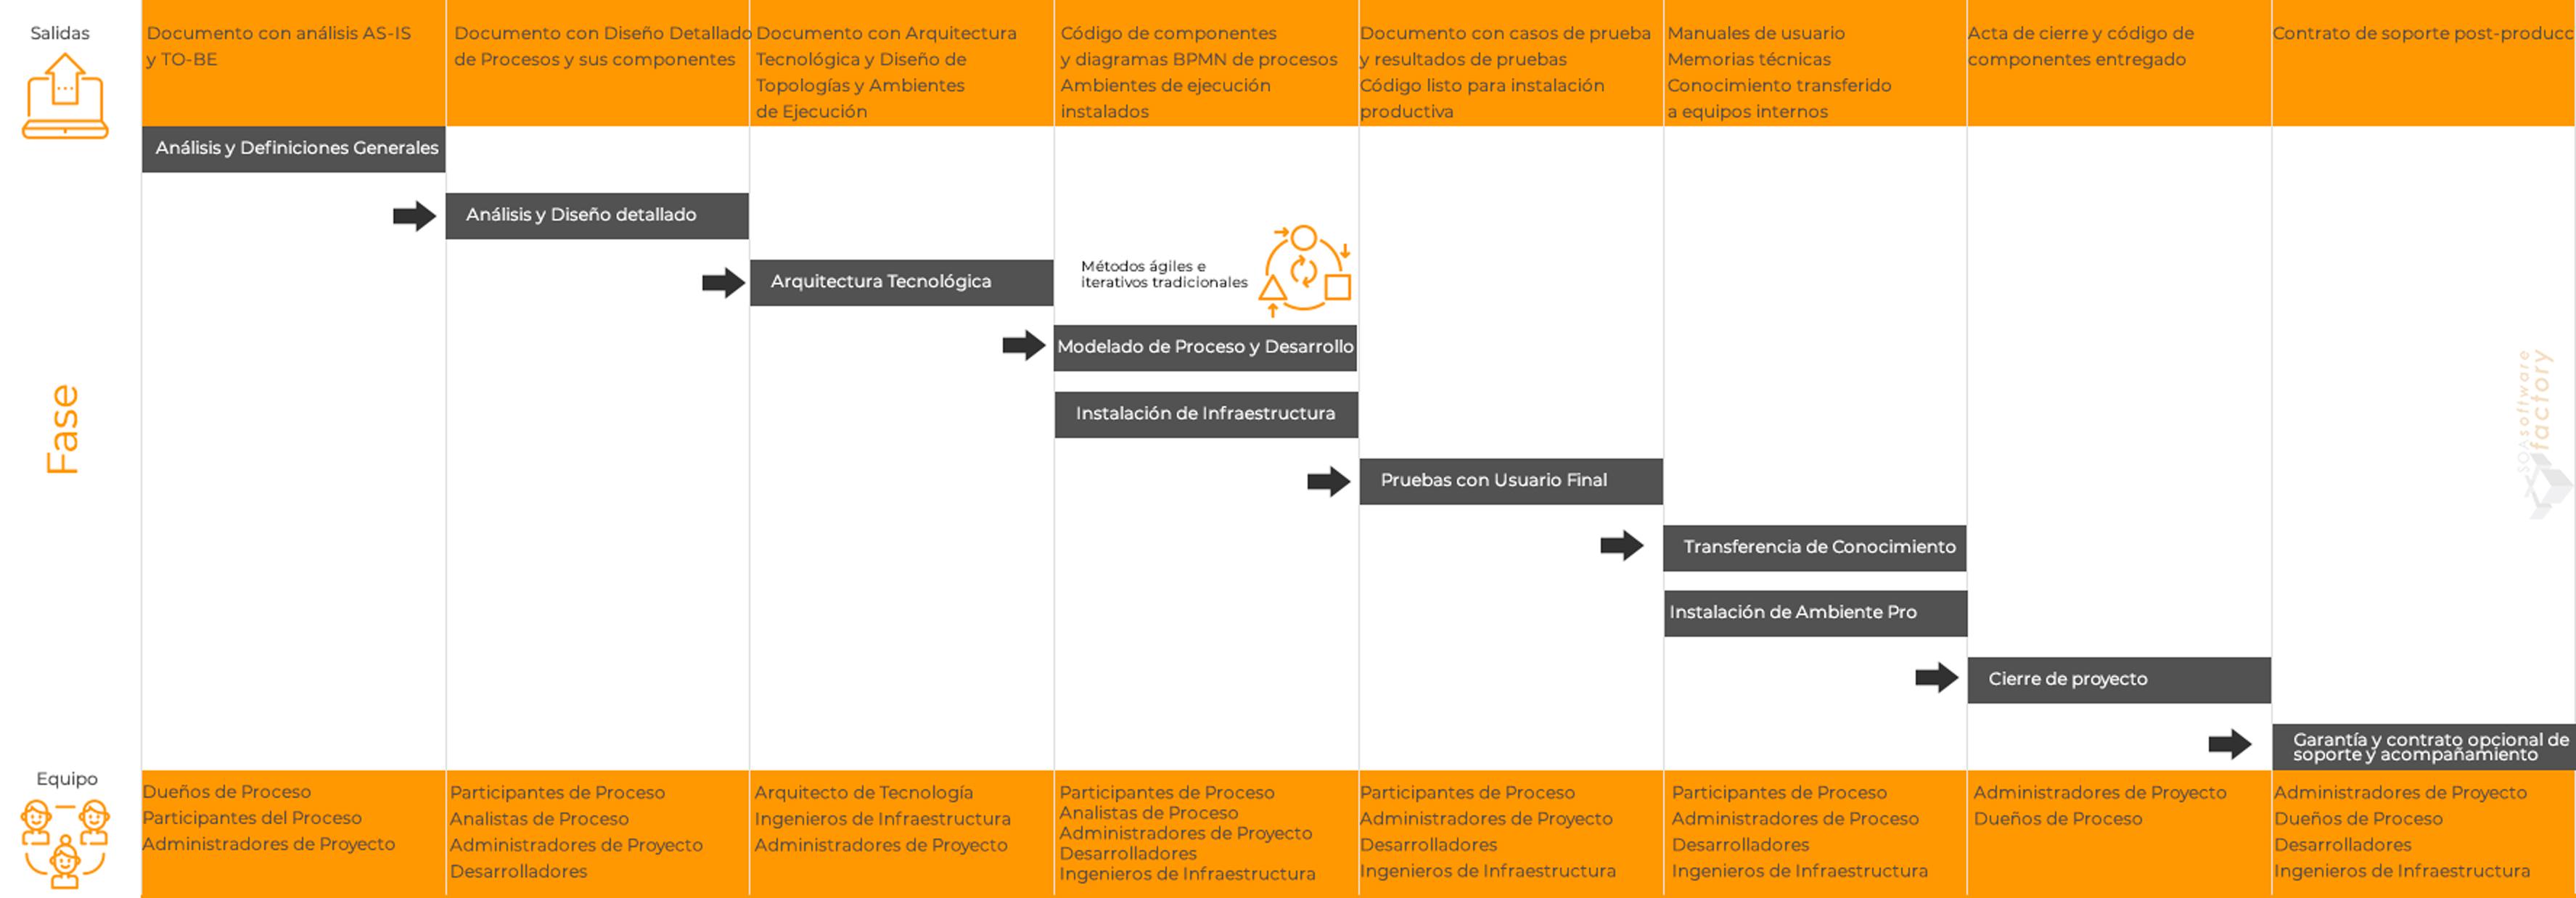 BPM_Project_Plan_ES